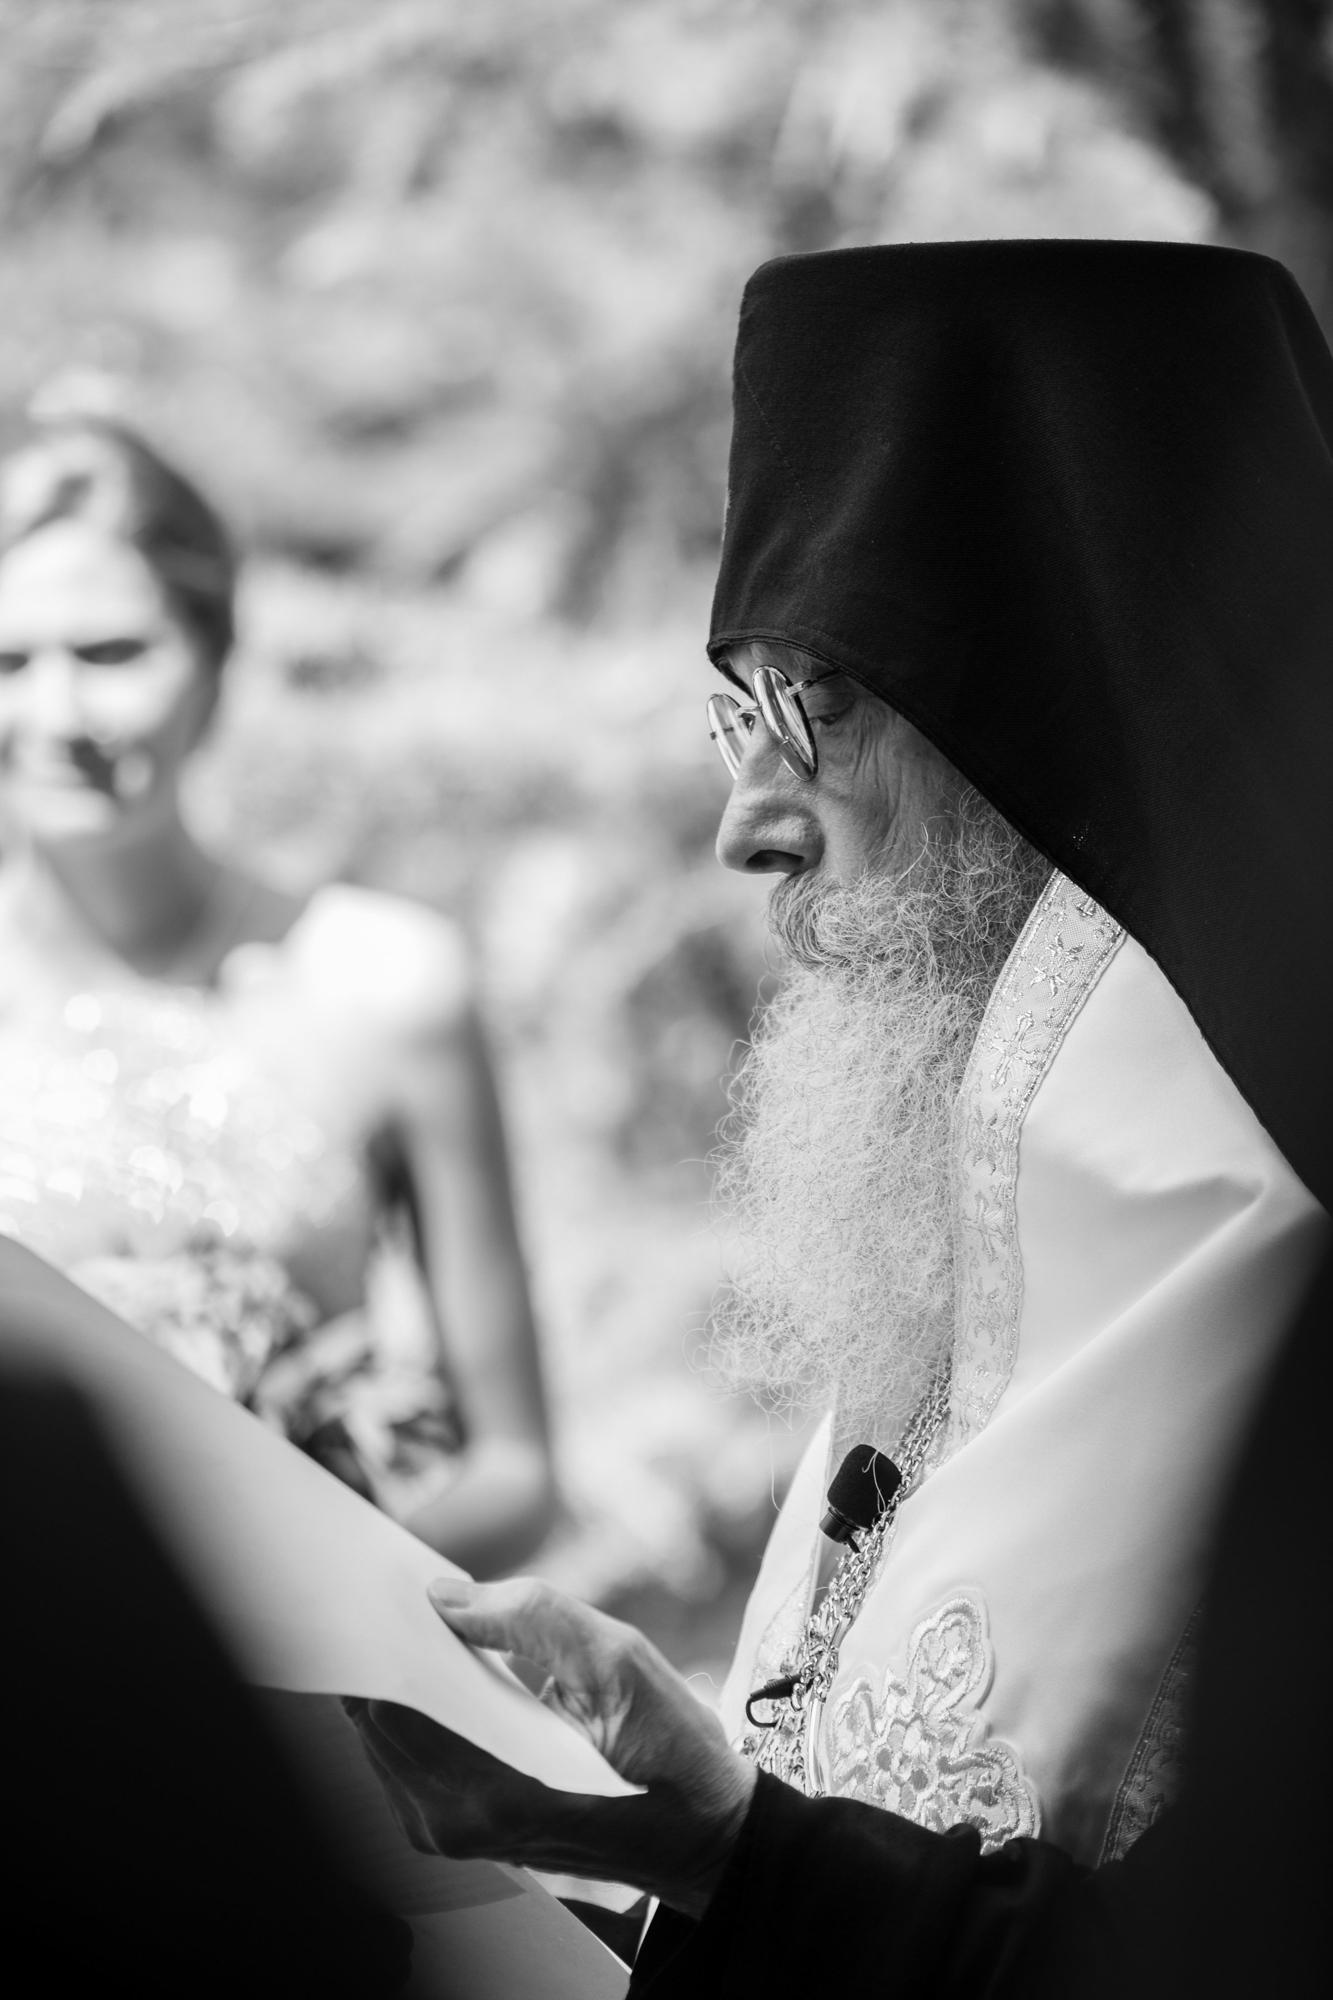 greek-wedding-salt-lake-city-utah-24.jpg